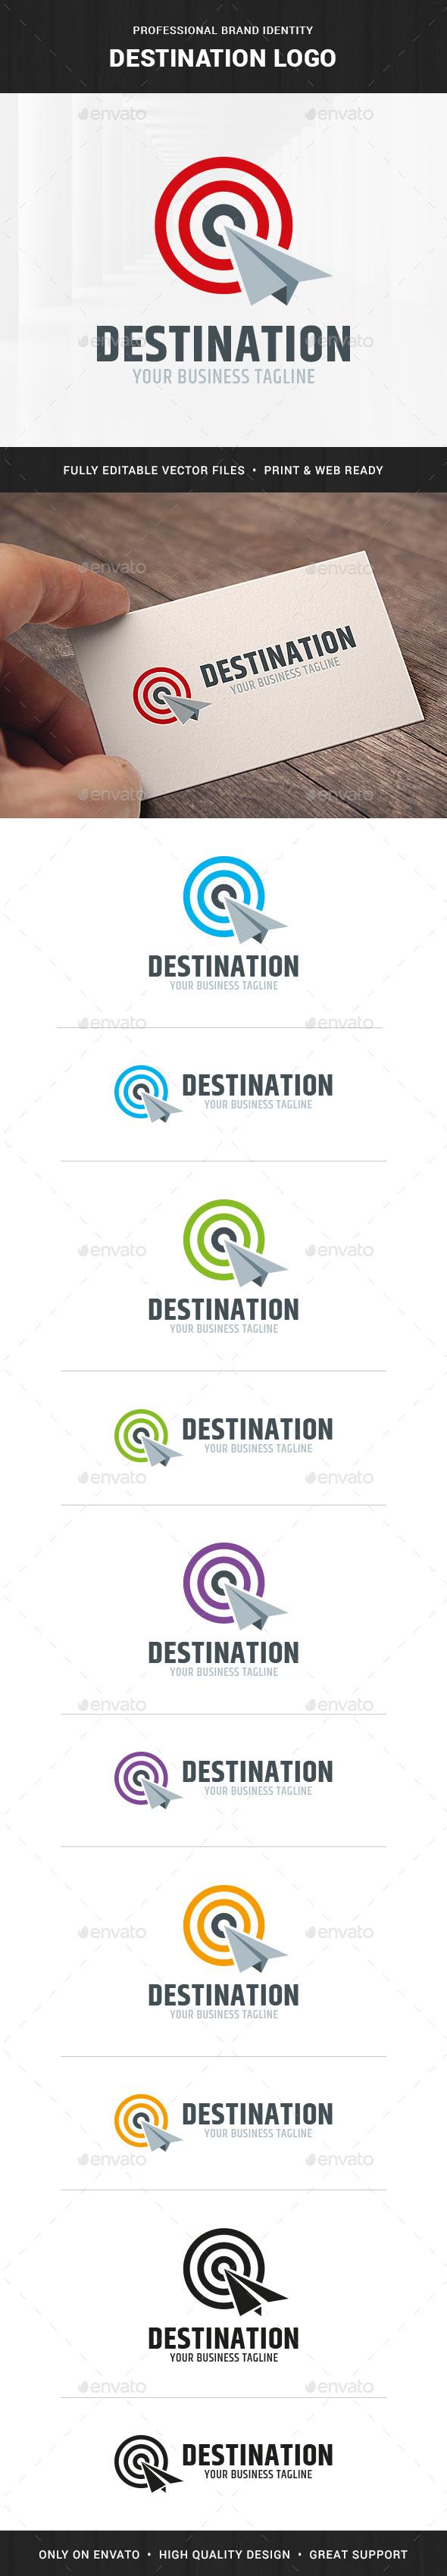 Destination Logo Template - Objects Logo Templates